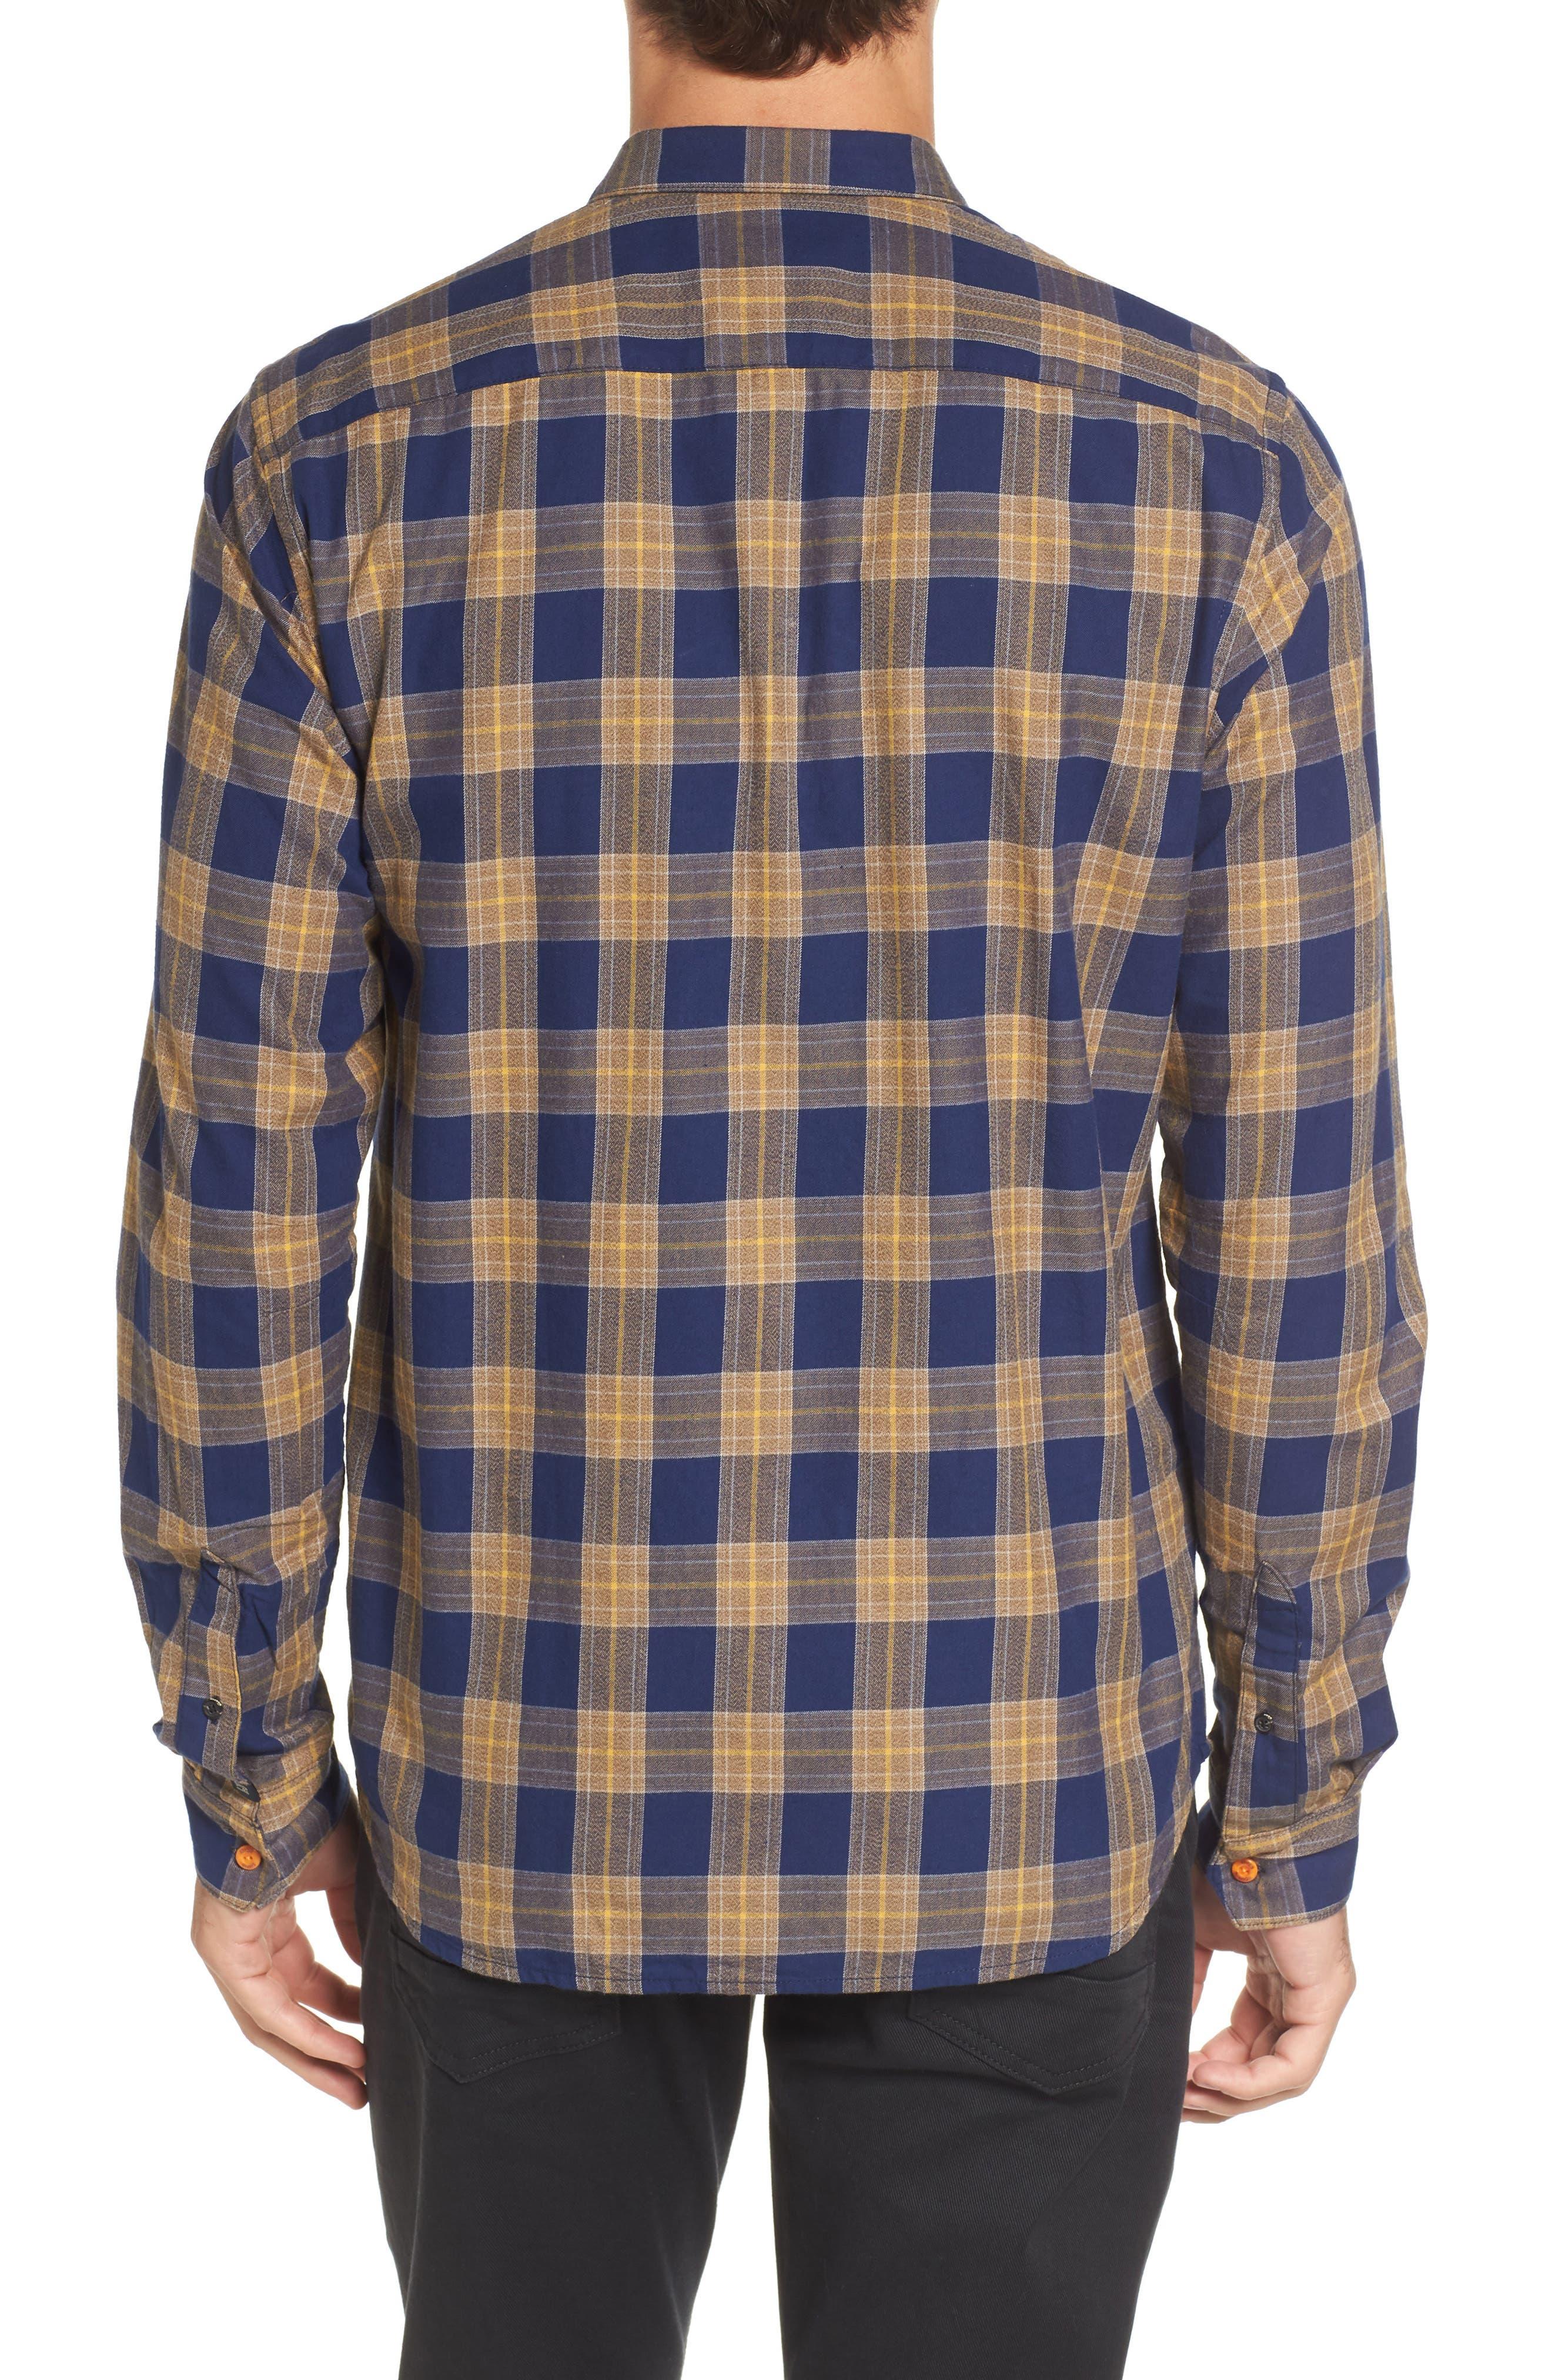 Scotch & Sode Brushed Cotton Shirt,                             Alternate thumbnail 2, color,                             Blue